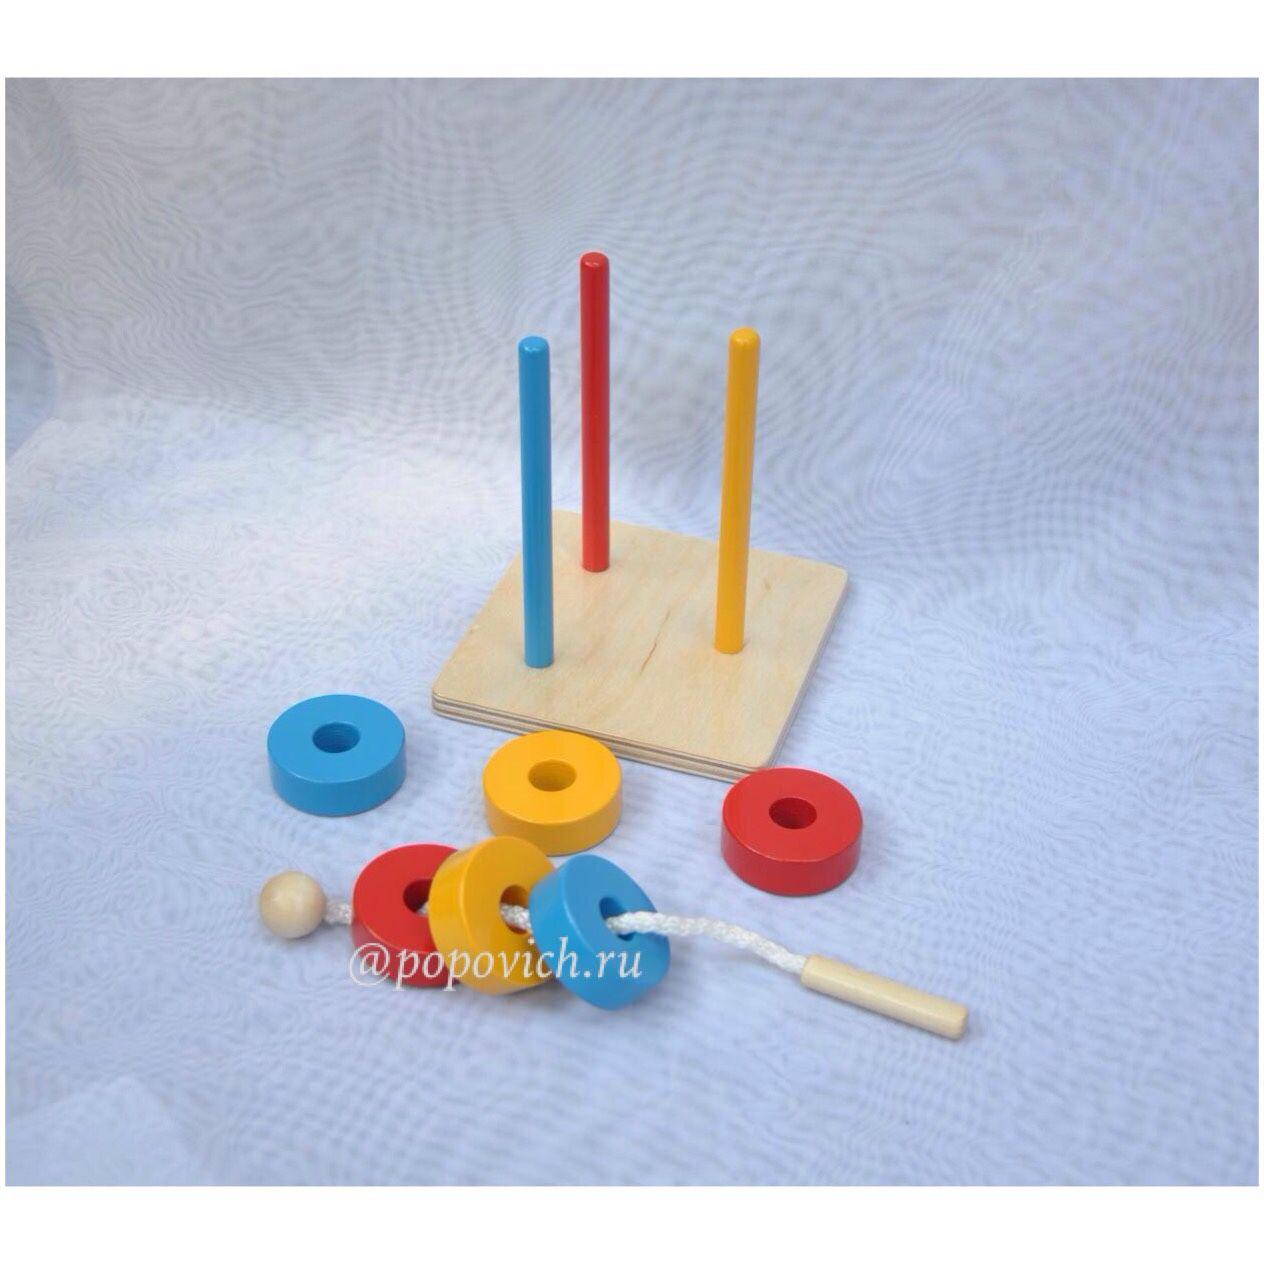 Educational toys Maria Montessori, Stuffed Toys, Cheboksary,  Фото №1